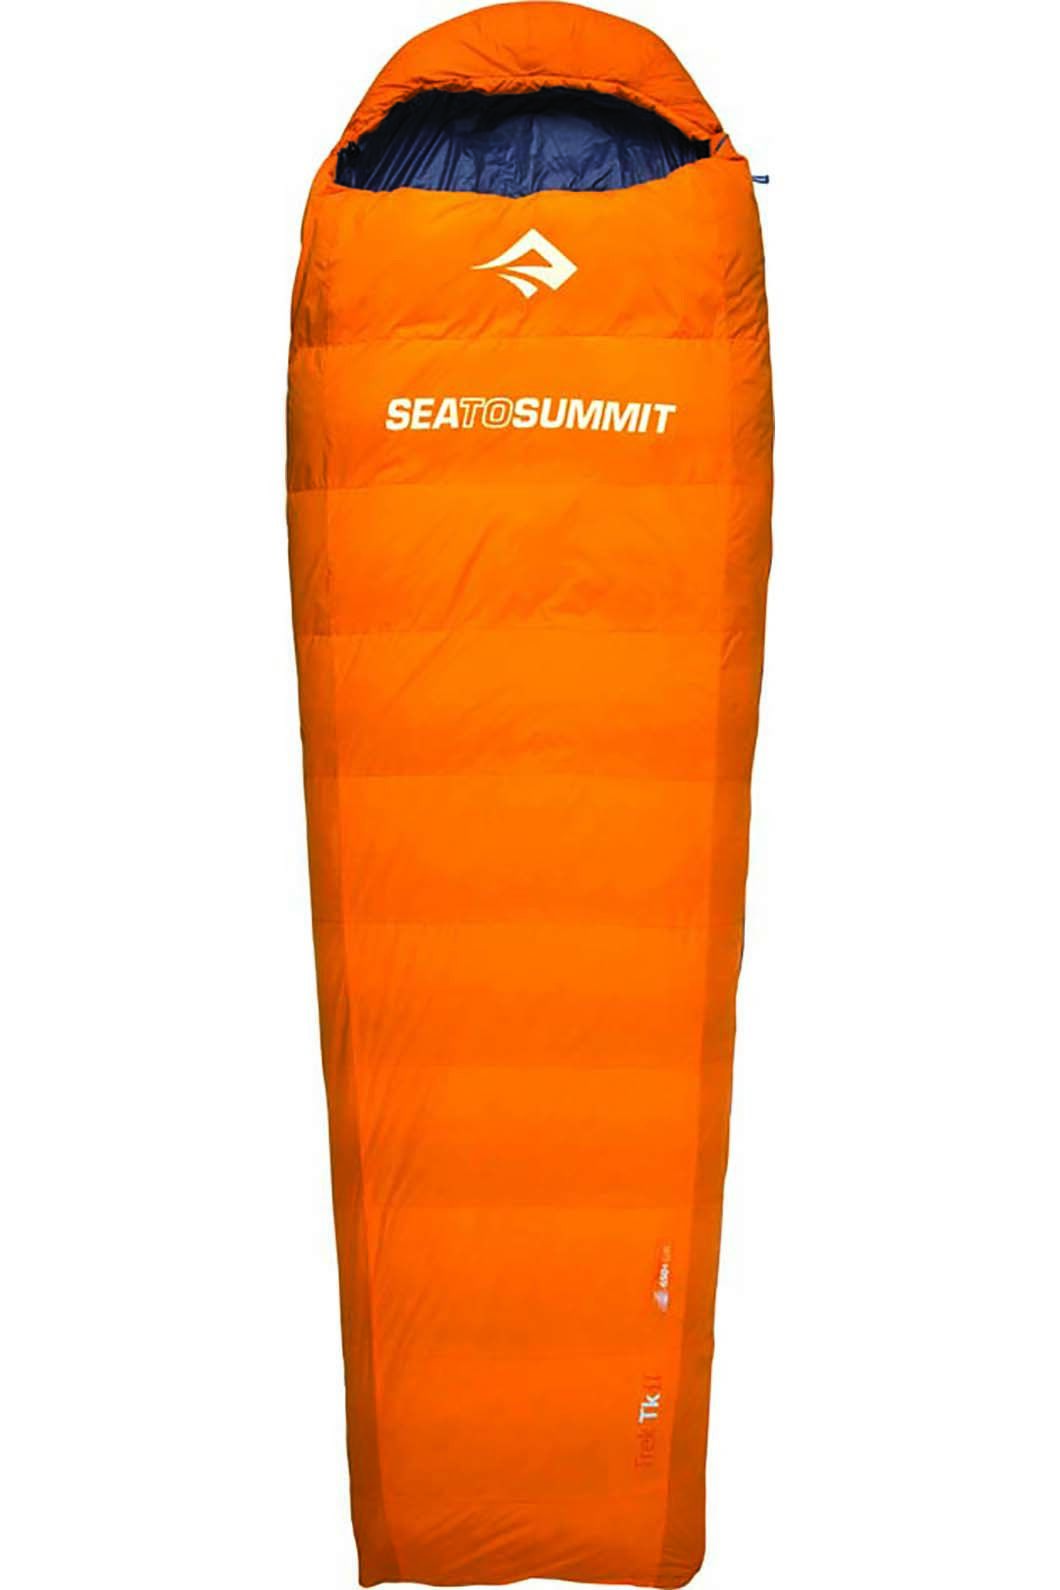 Sea to Summit Trek TKII Left Handed Zip Sleeping Bag, None, hi-res